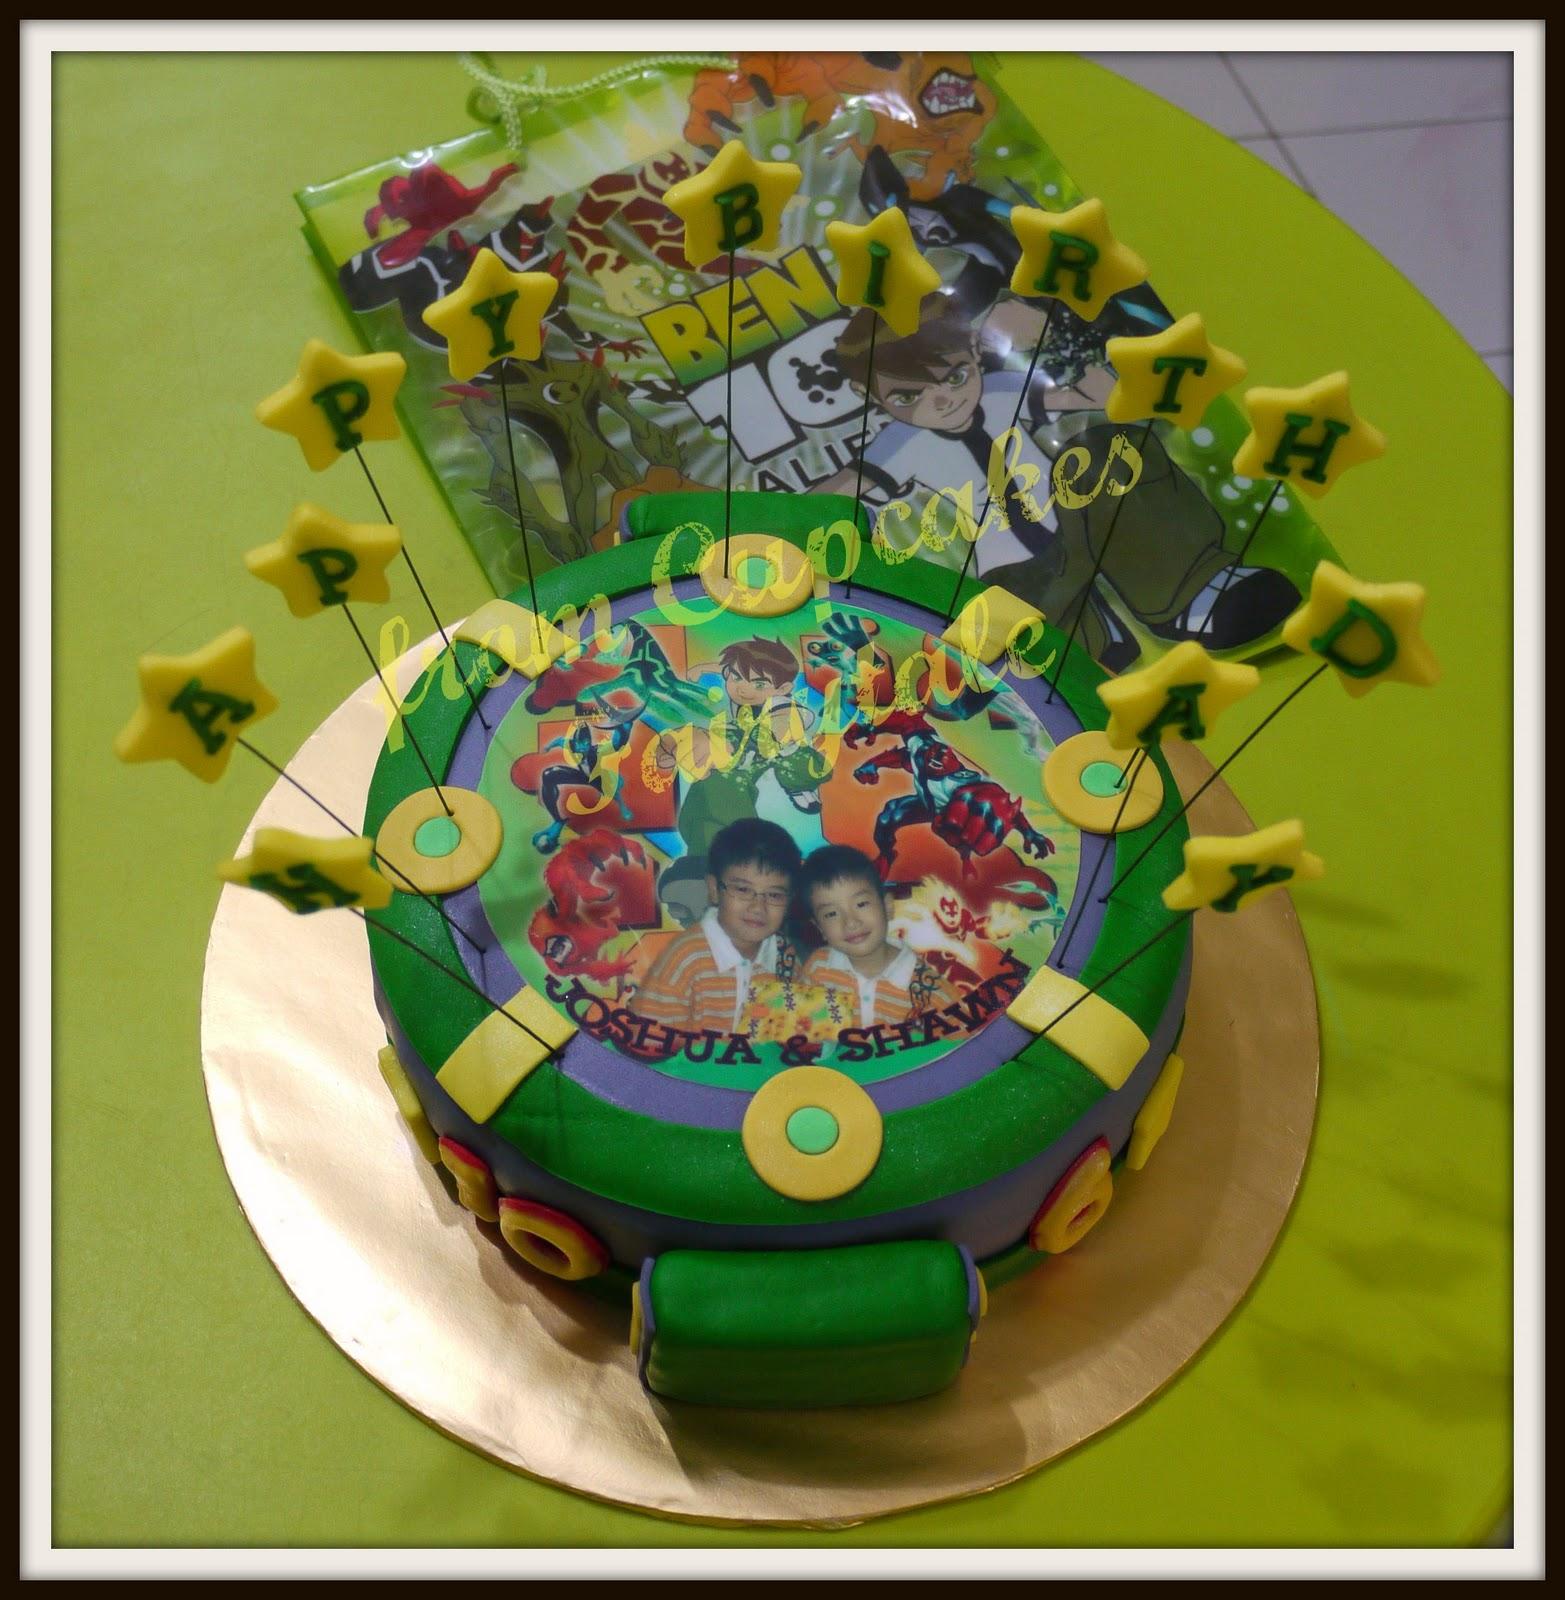 Cupcakes Fairytale: JOSHUA & SHAWN'S BEN 10 BIRTHDAY CAKE